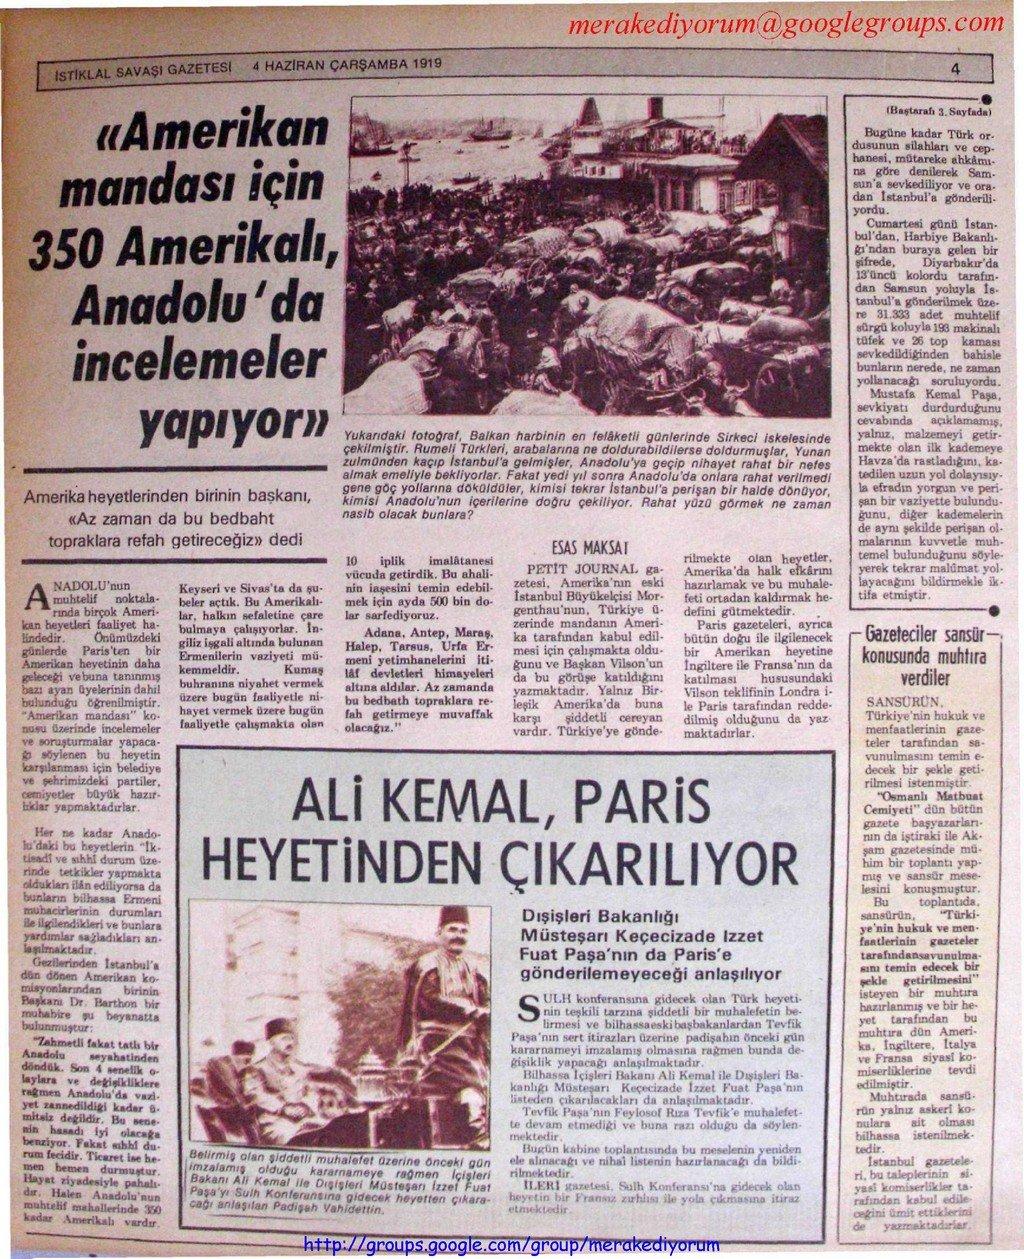 istiklal savaşı gazetesi - 04 Haziran 1919